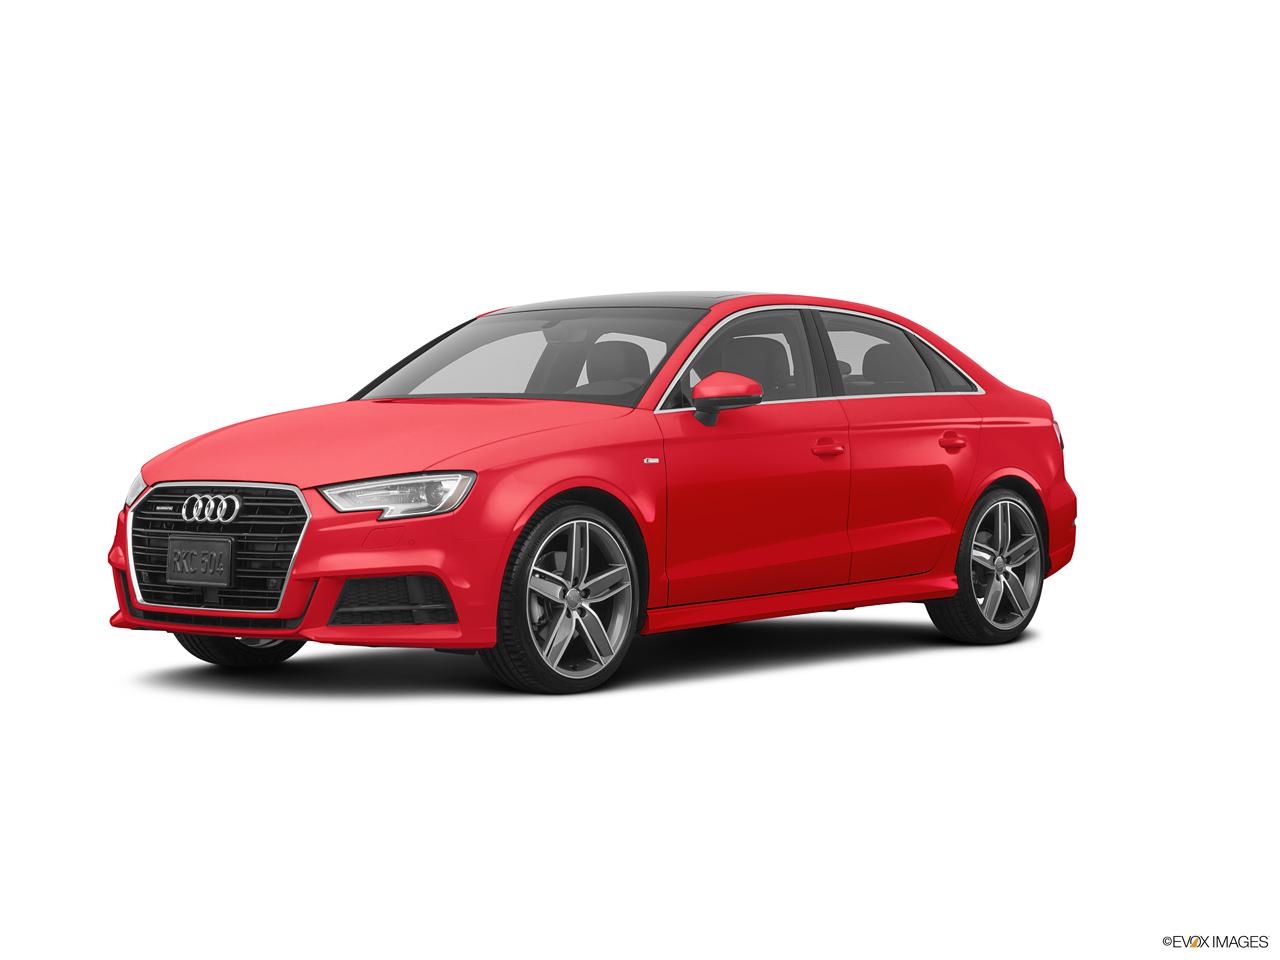 Audi A3 Sedan 2017 Sport 40 2 0 Tfsi 190 Hp In Uae New